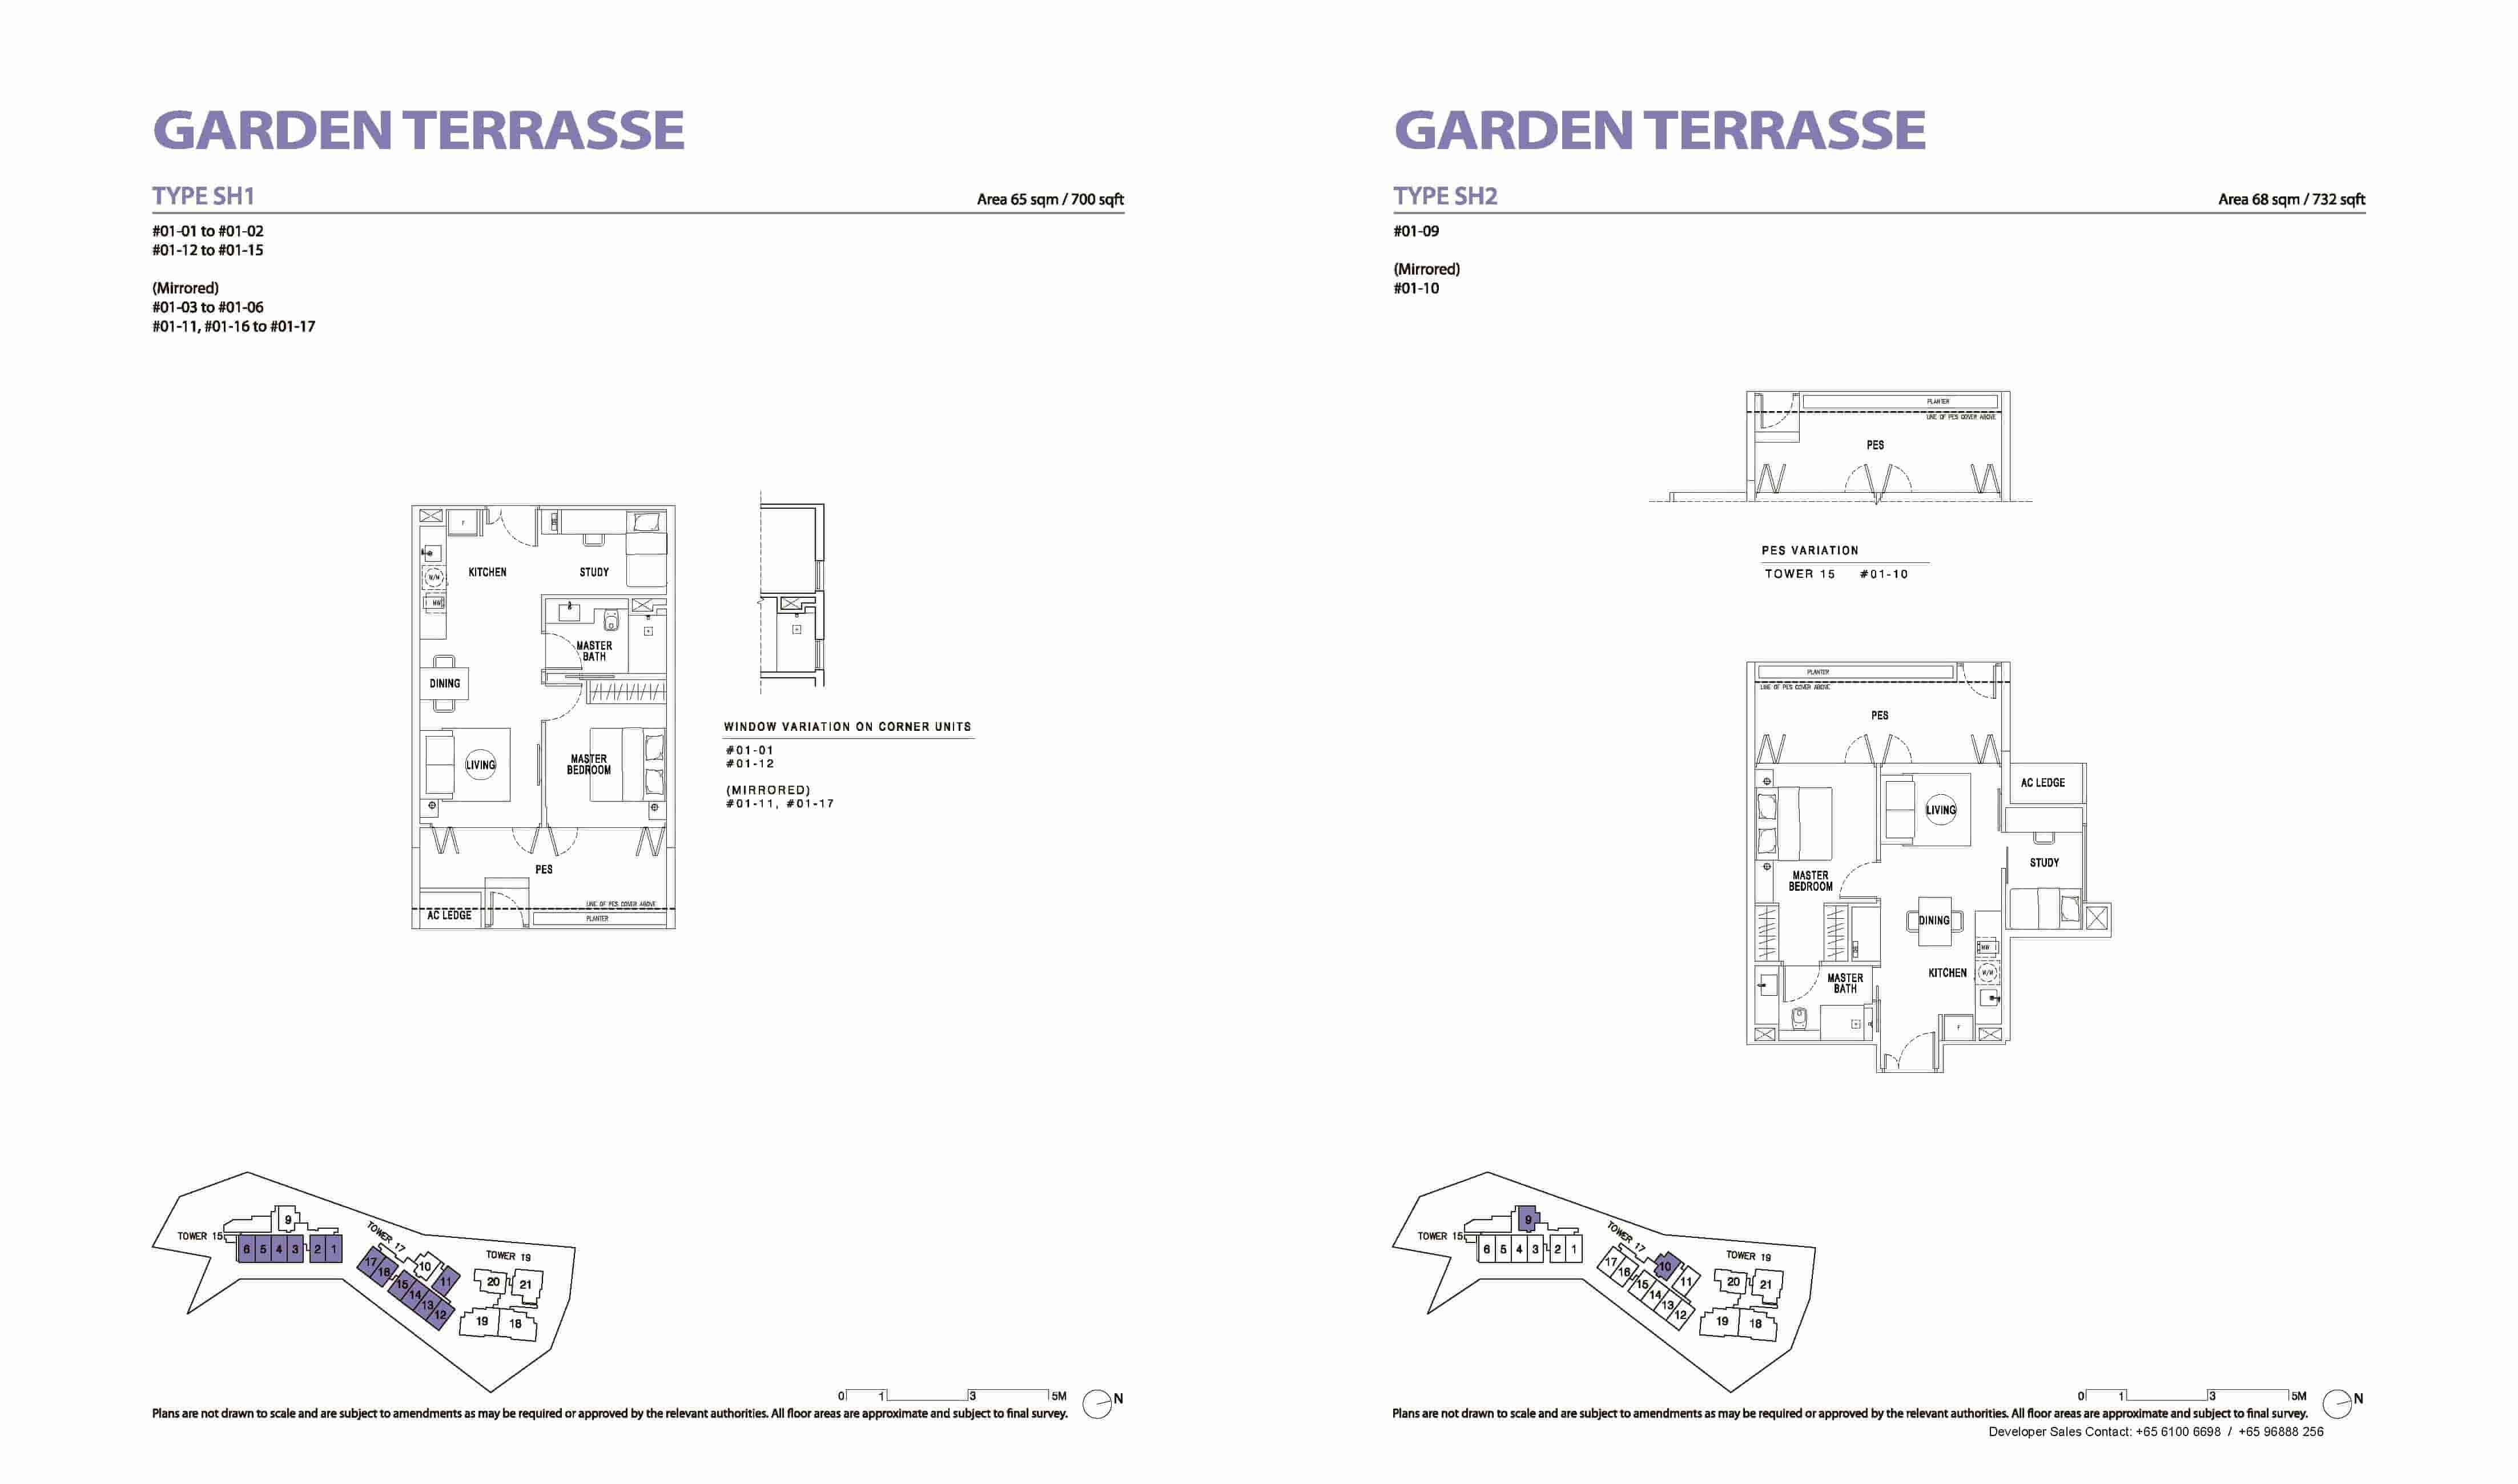 Type SH1 & SH2 1+Study, Garden Terrasse